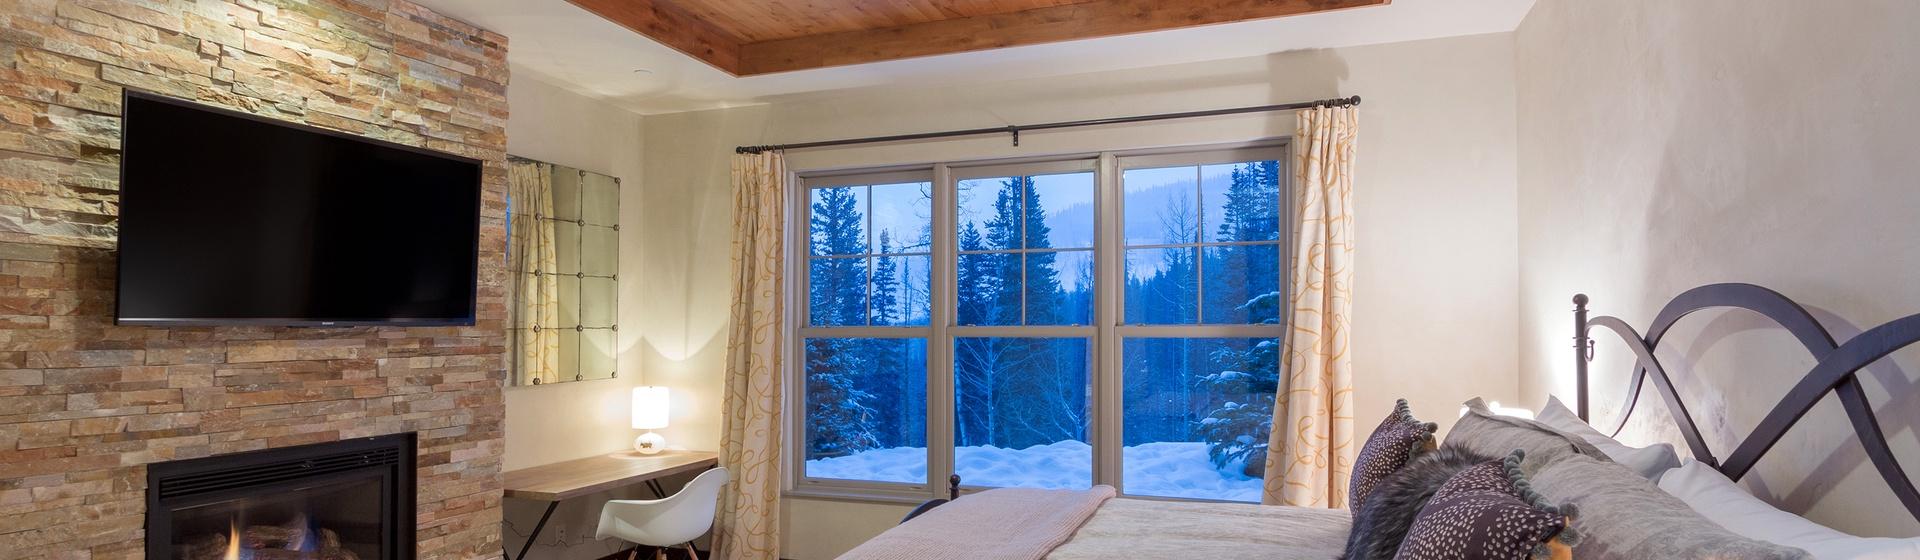 13-Telluride-Cassidy-Ridge-A103-Master-Bedroom-2-Web.jpg